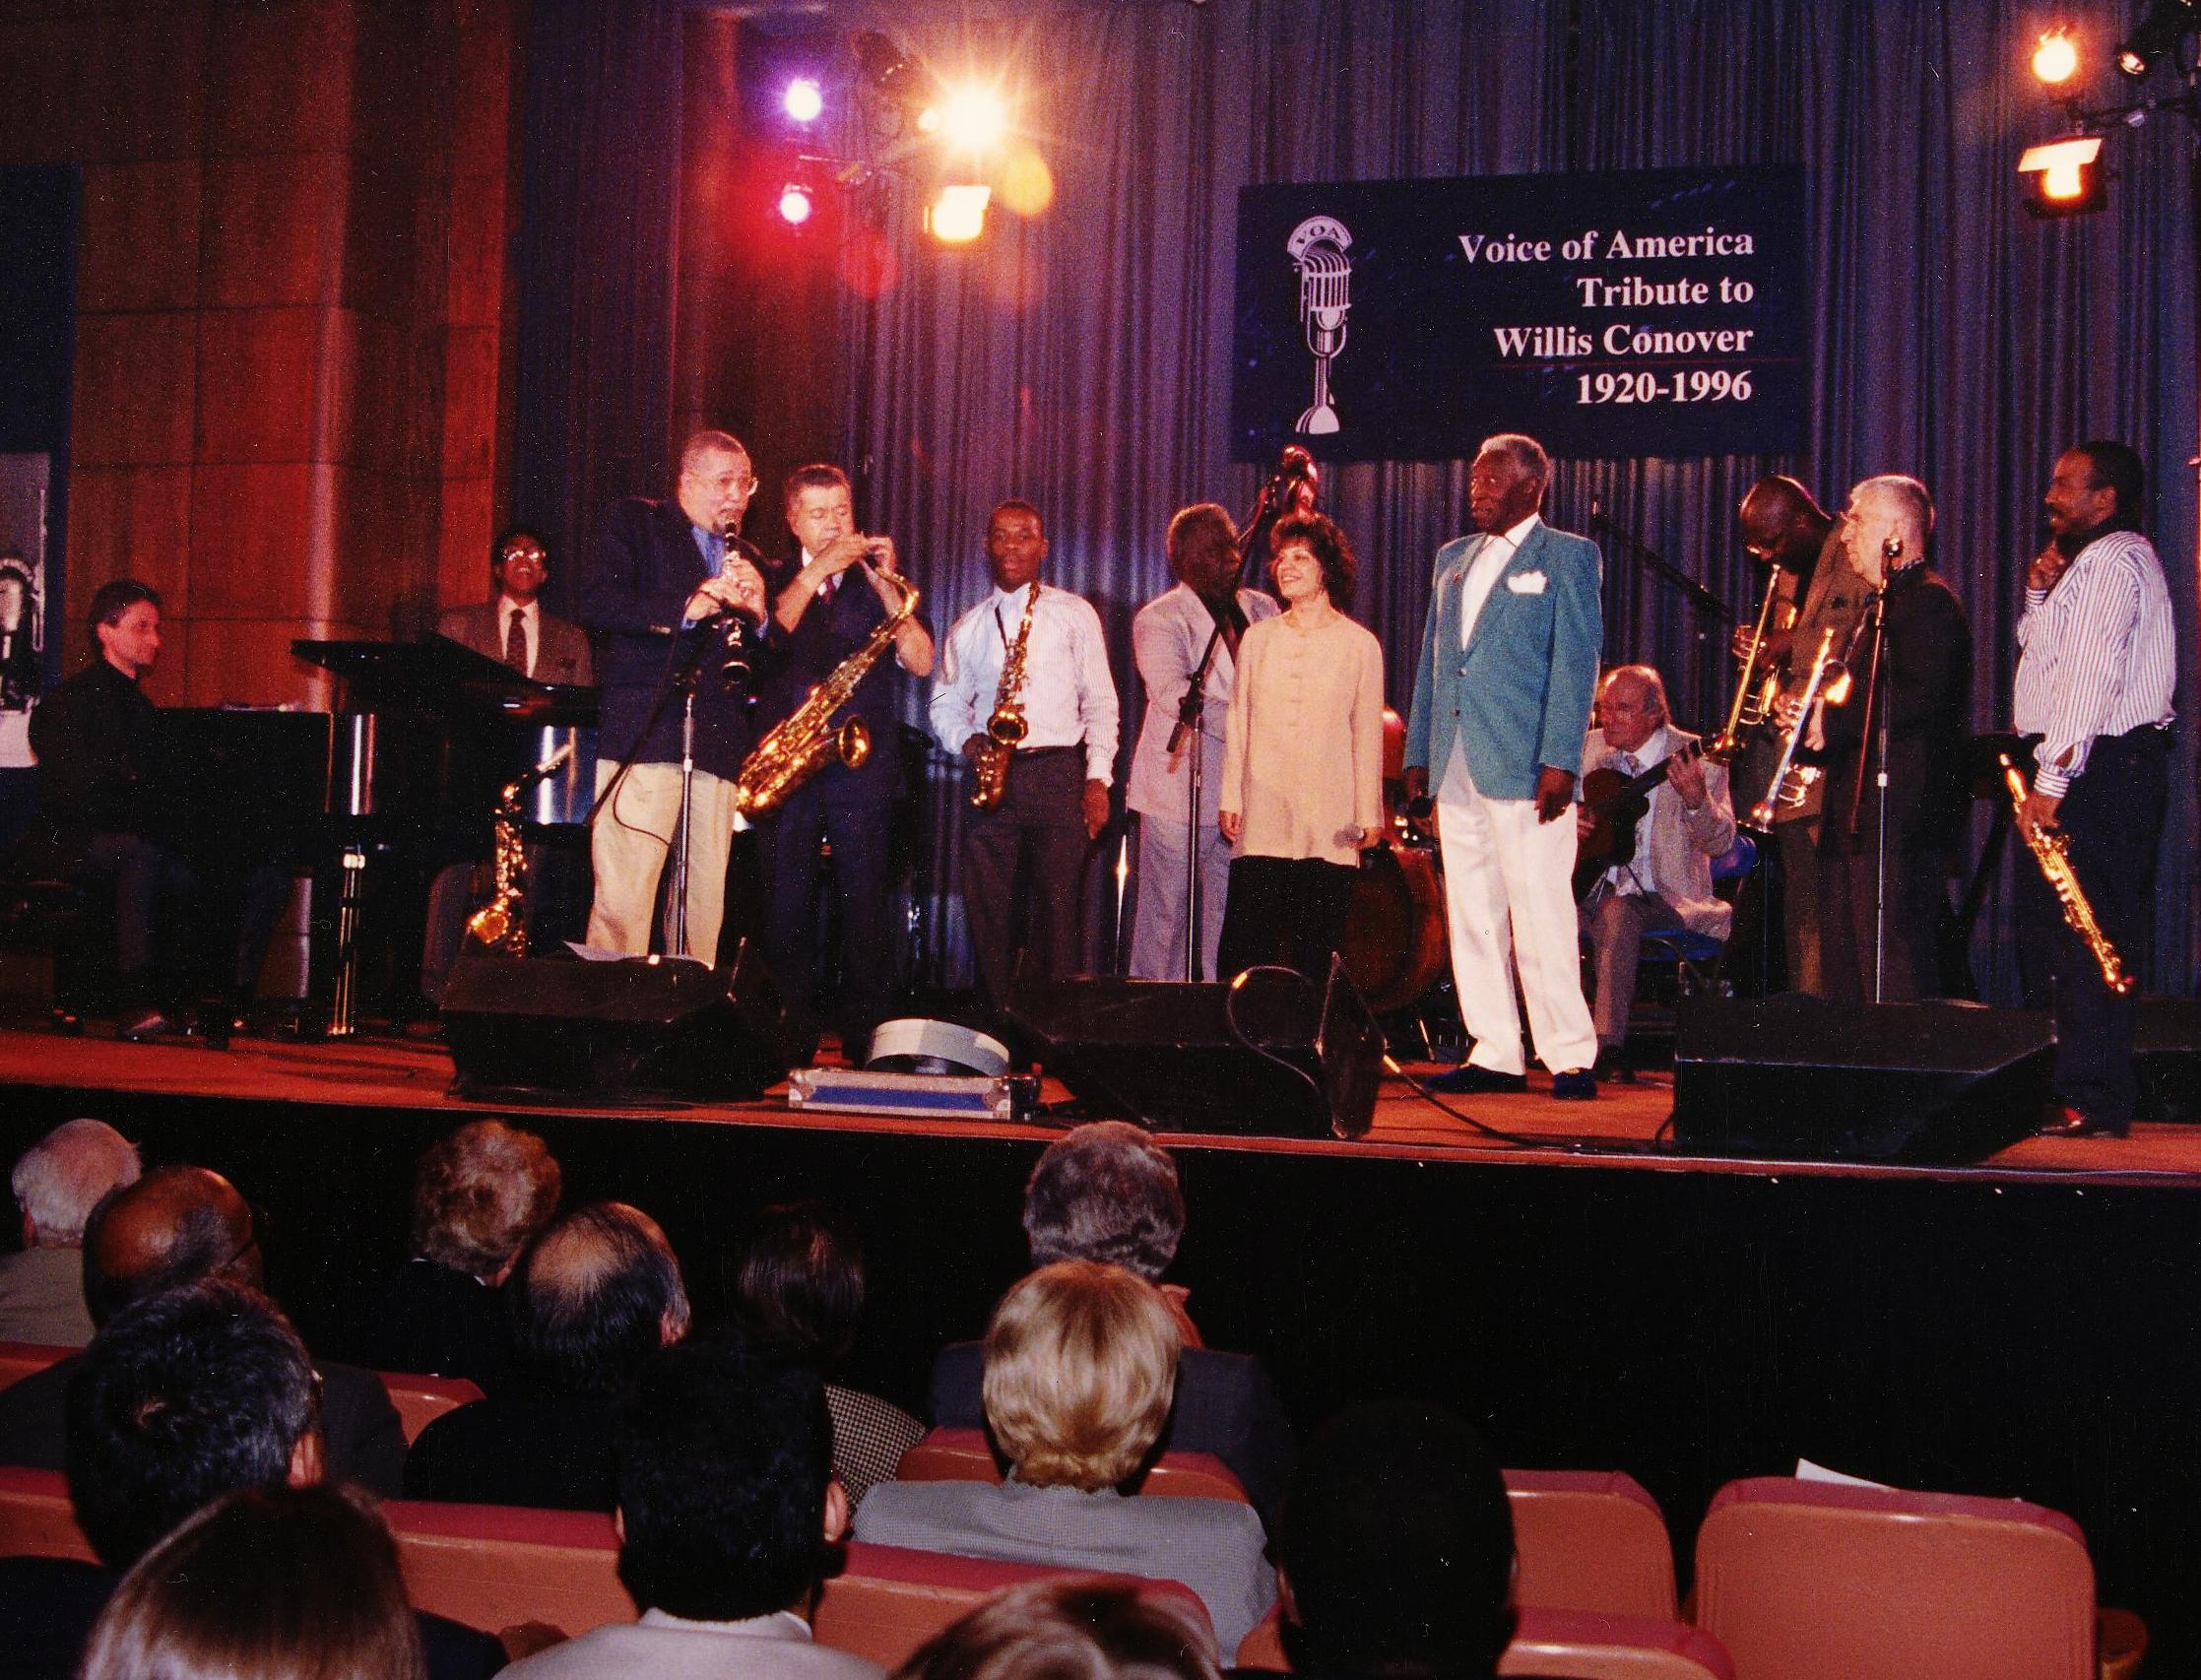 Voice of America tribute to Willis Conover-k.jpg